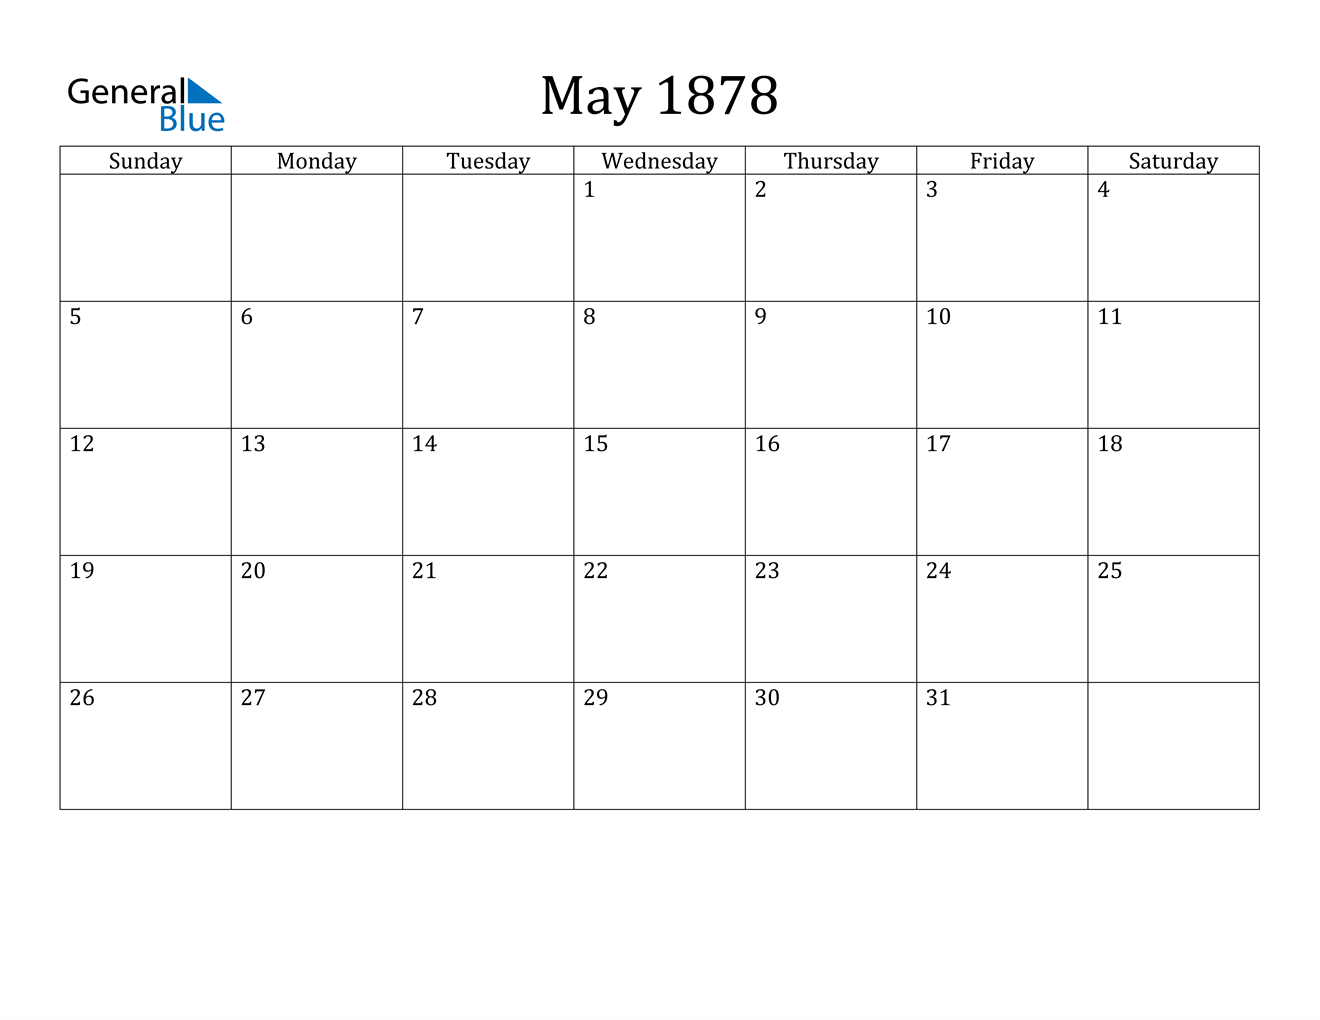 Image of May 1878 Calendar